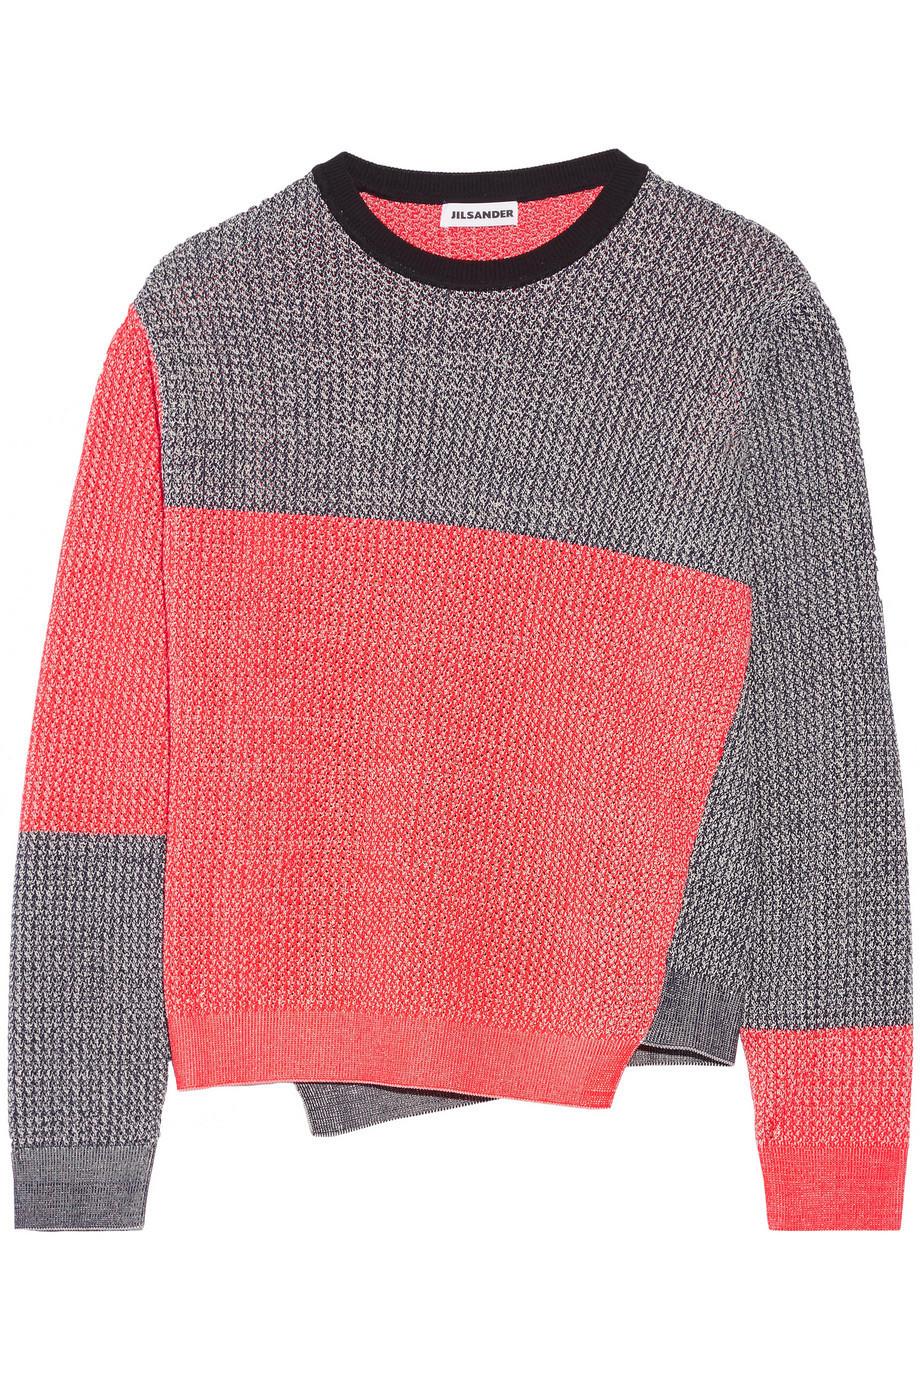 a5ff96a59 Jil Sander Color-Block Mélange Cotton-Blend Sweater in navy / red